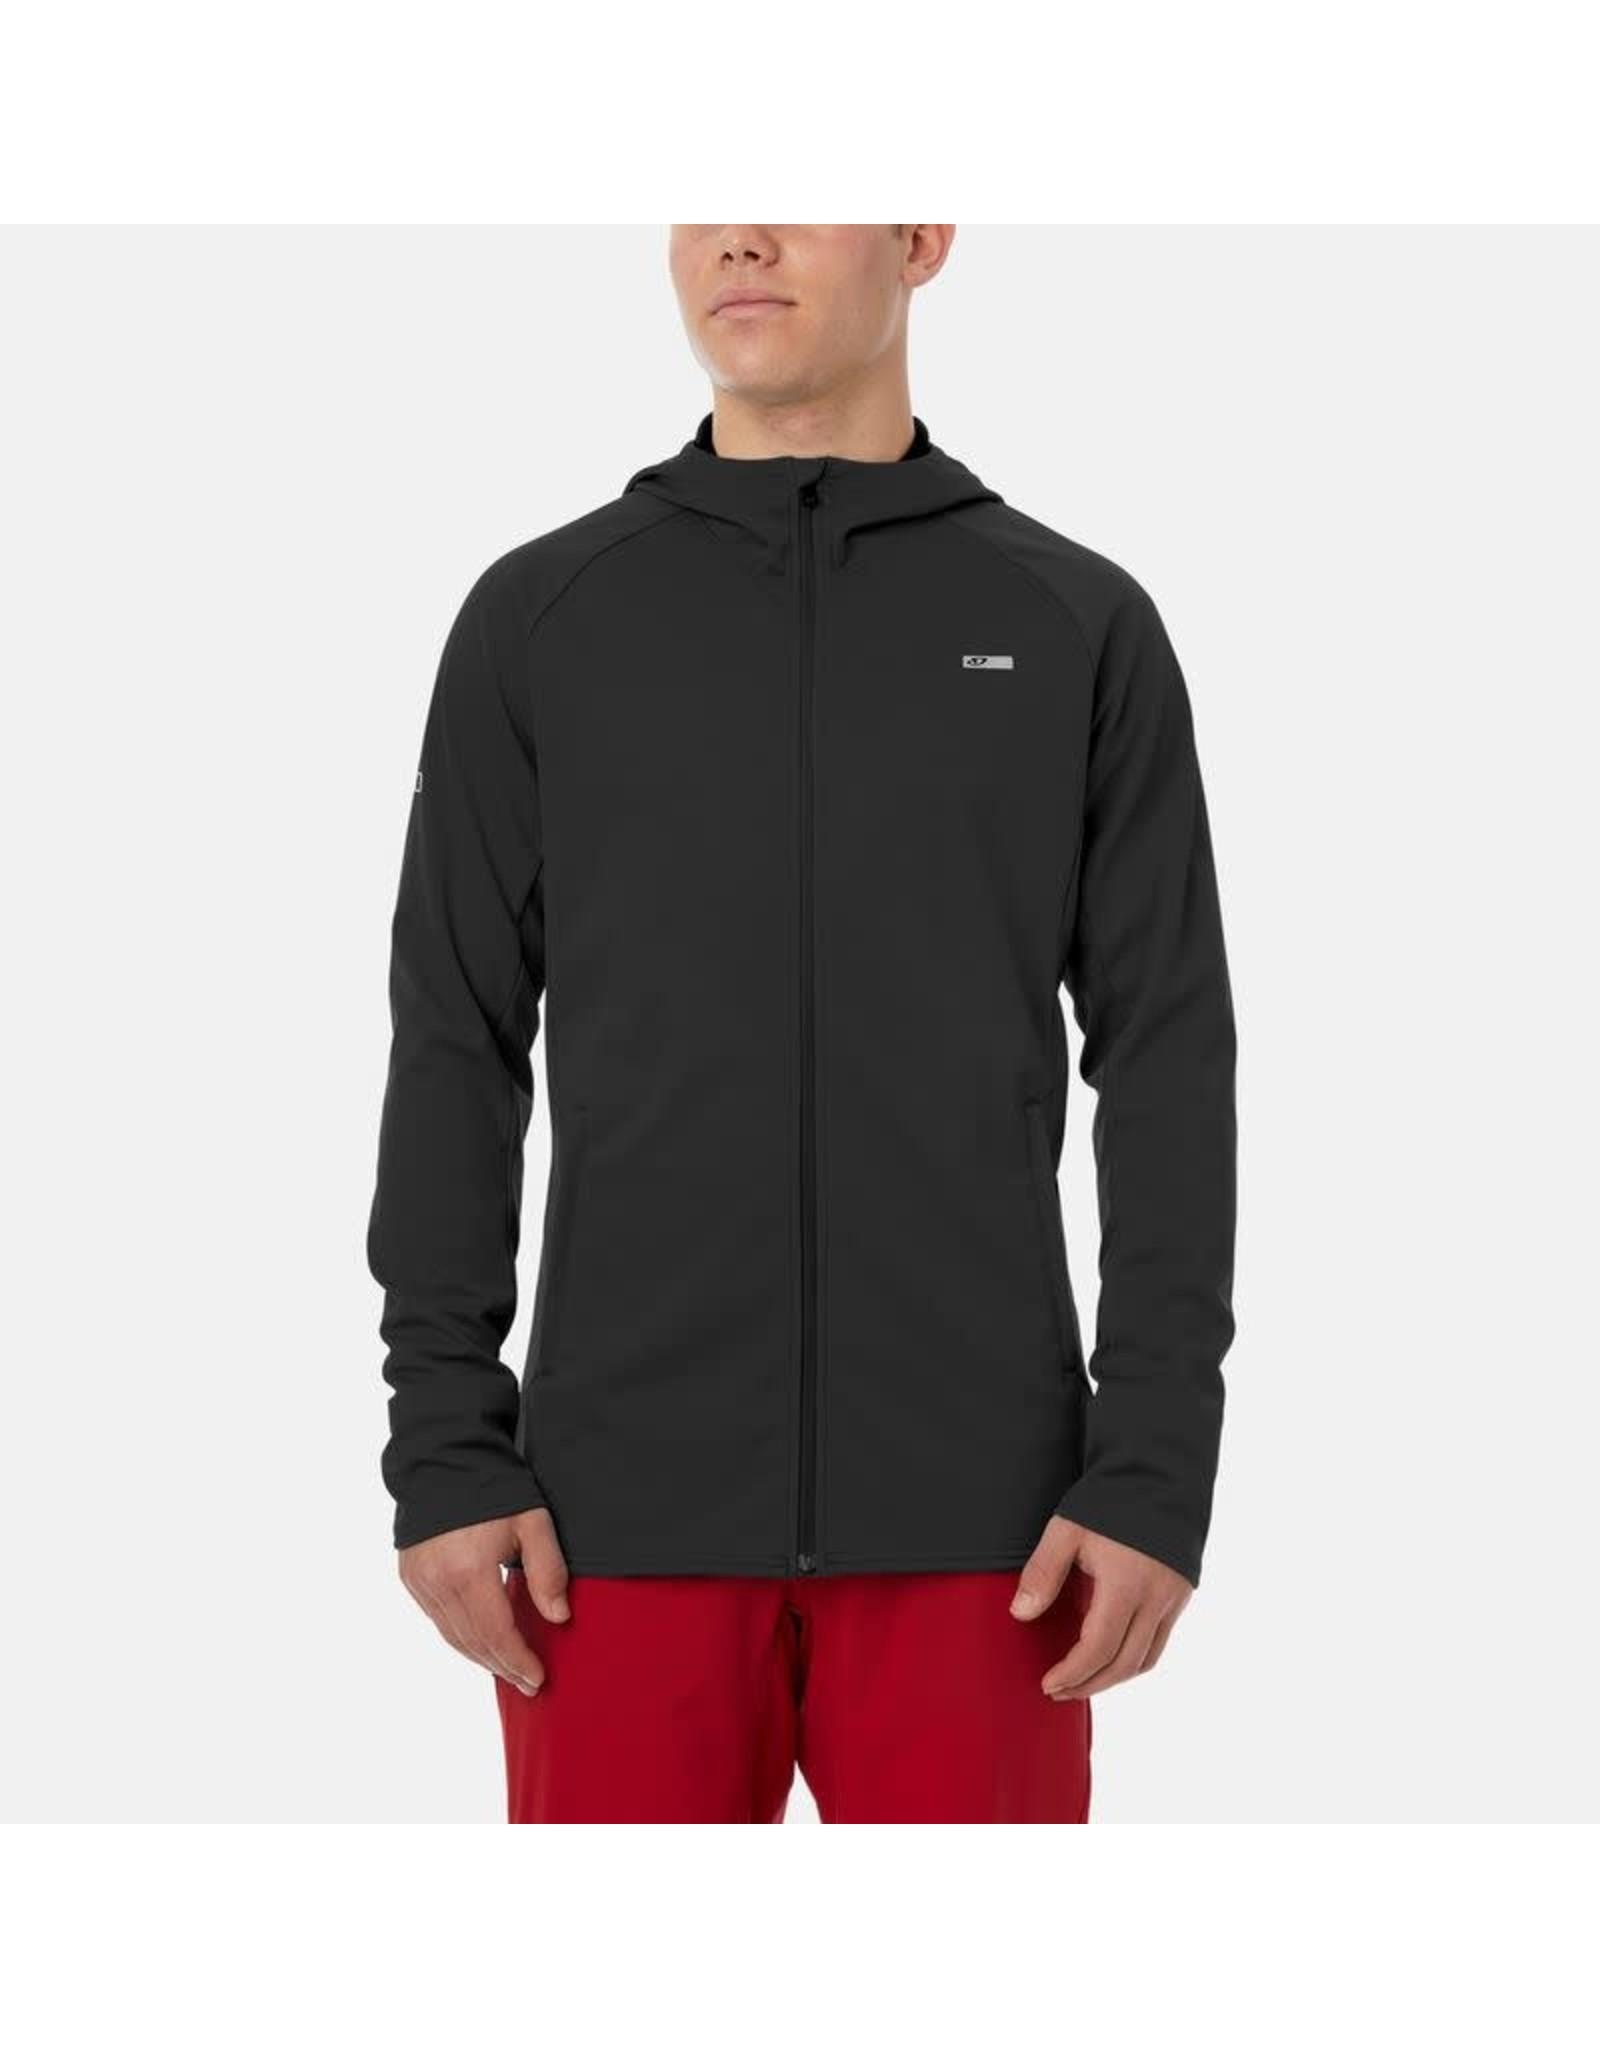 Giro Cycling Giro Cycling Mens Ambient Jacket Black